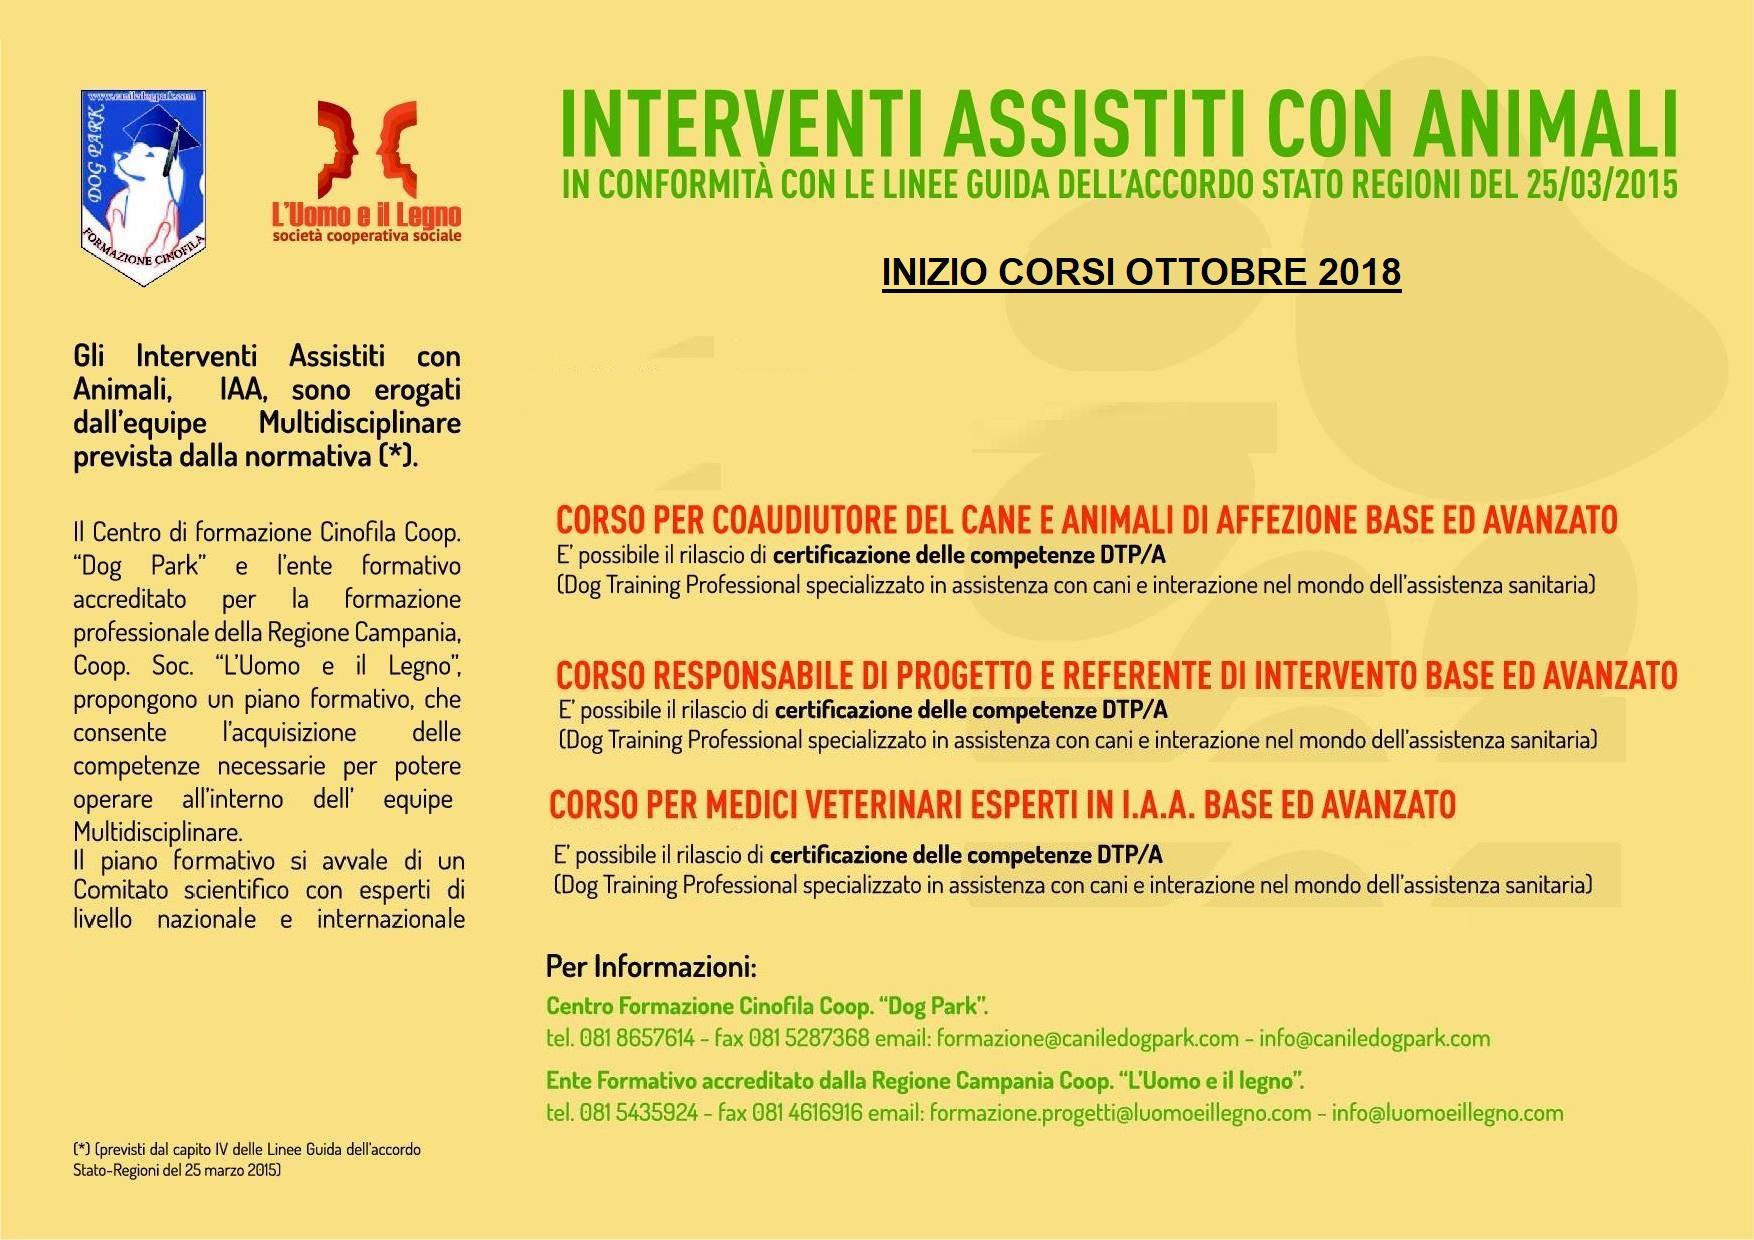 CORSO I.A.A. BASE/AVANZATO COAUDITORE DEL CANE